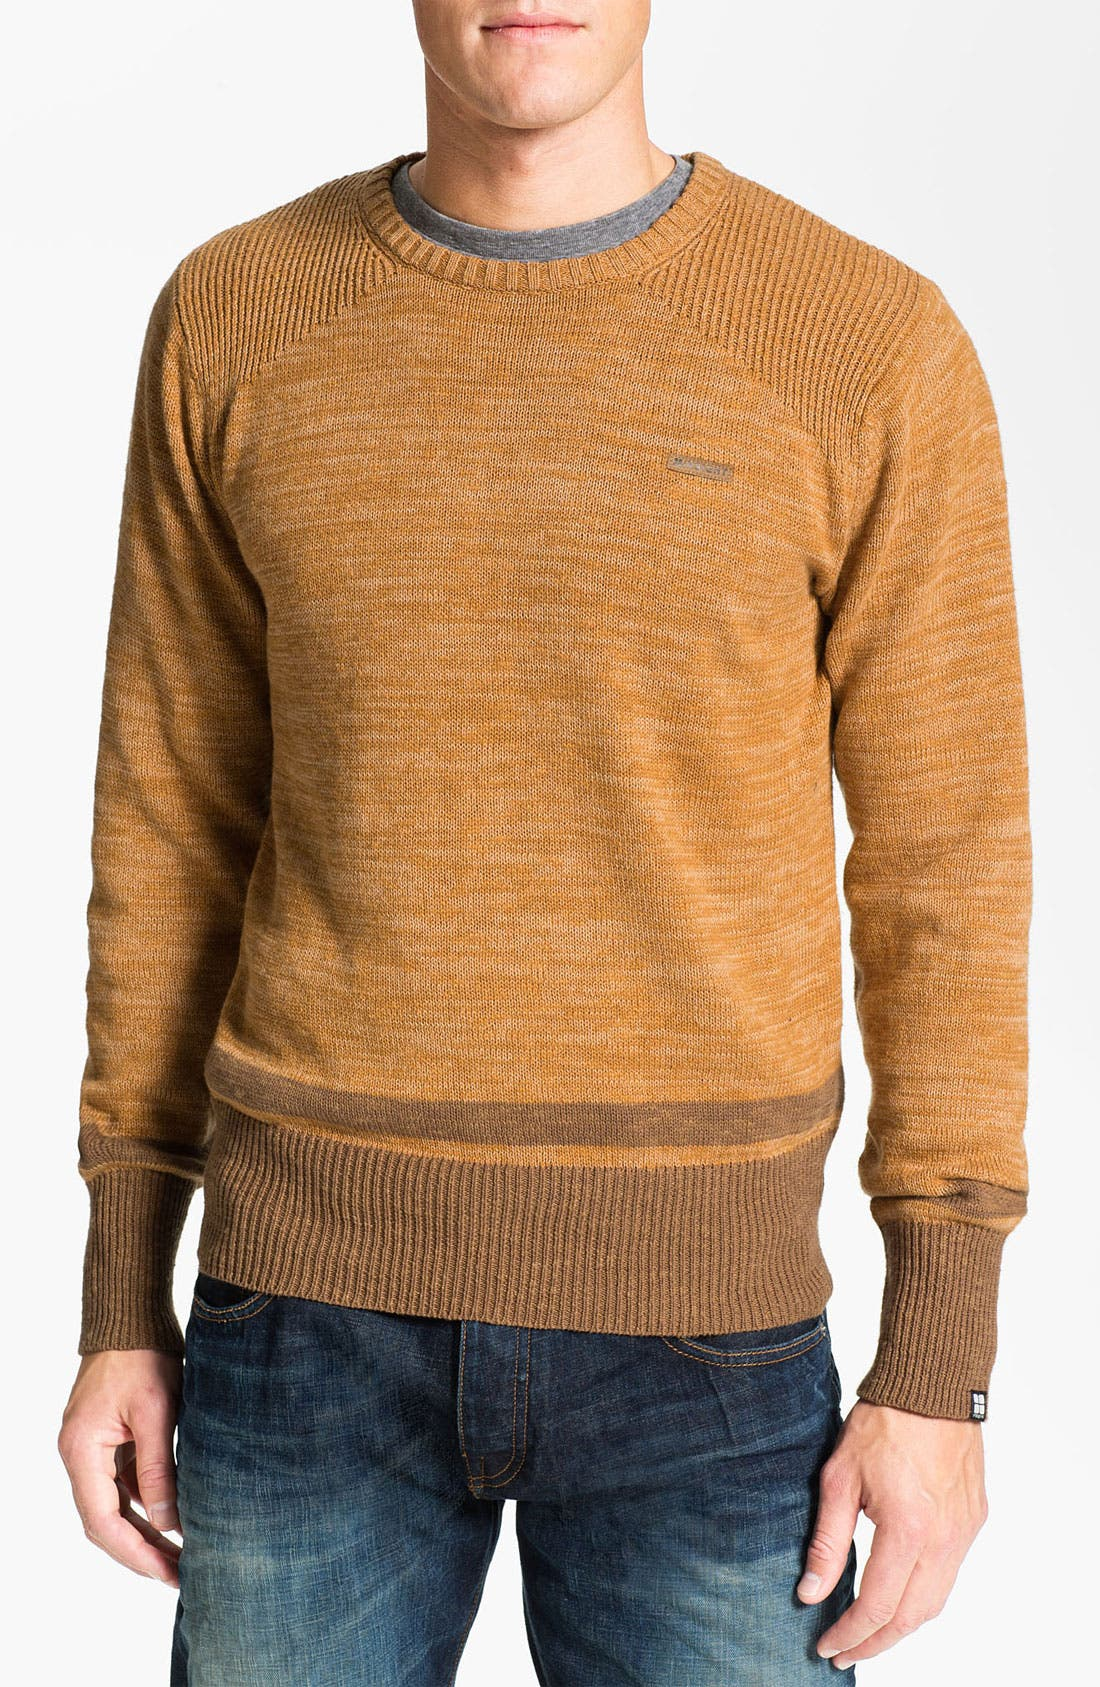 Main Image - Insight 'The Meek' Crewneck Sweater